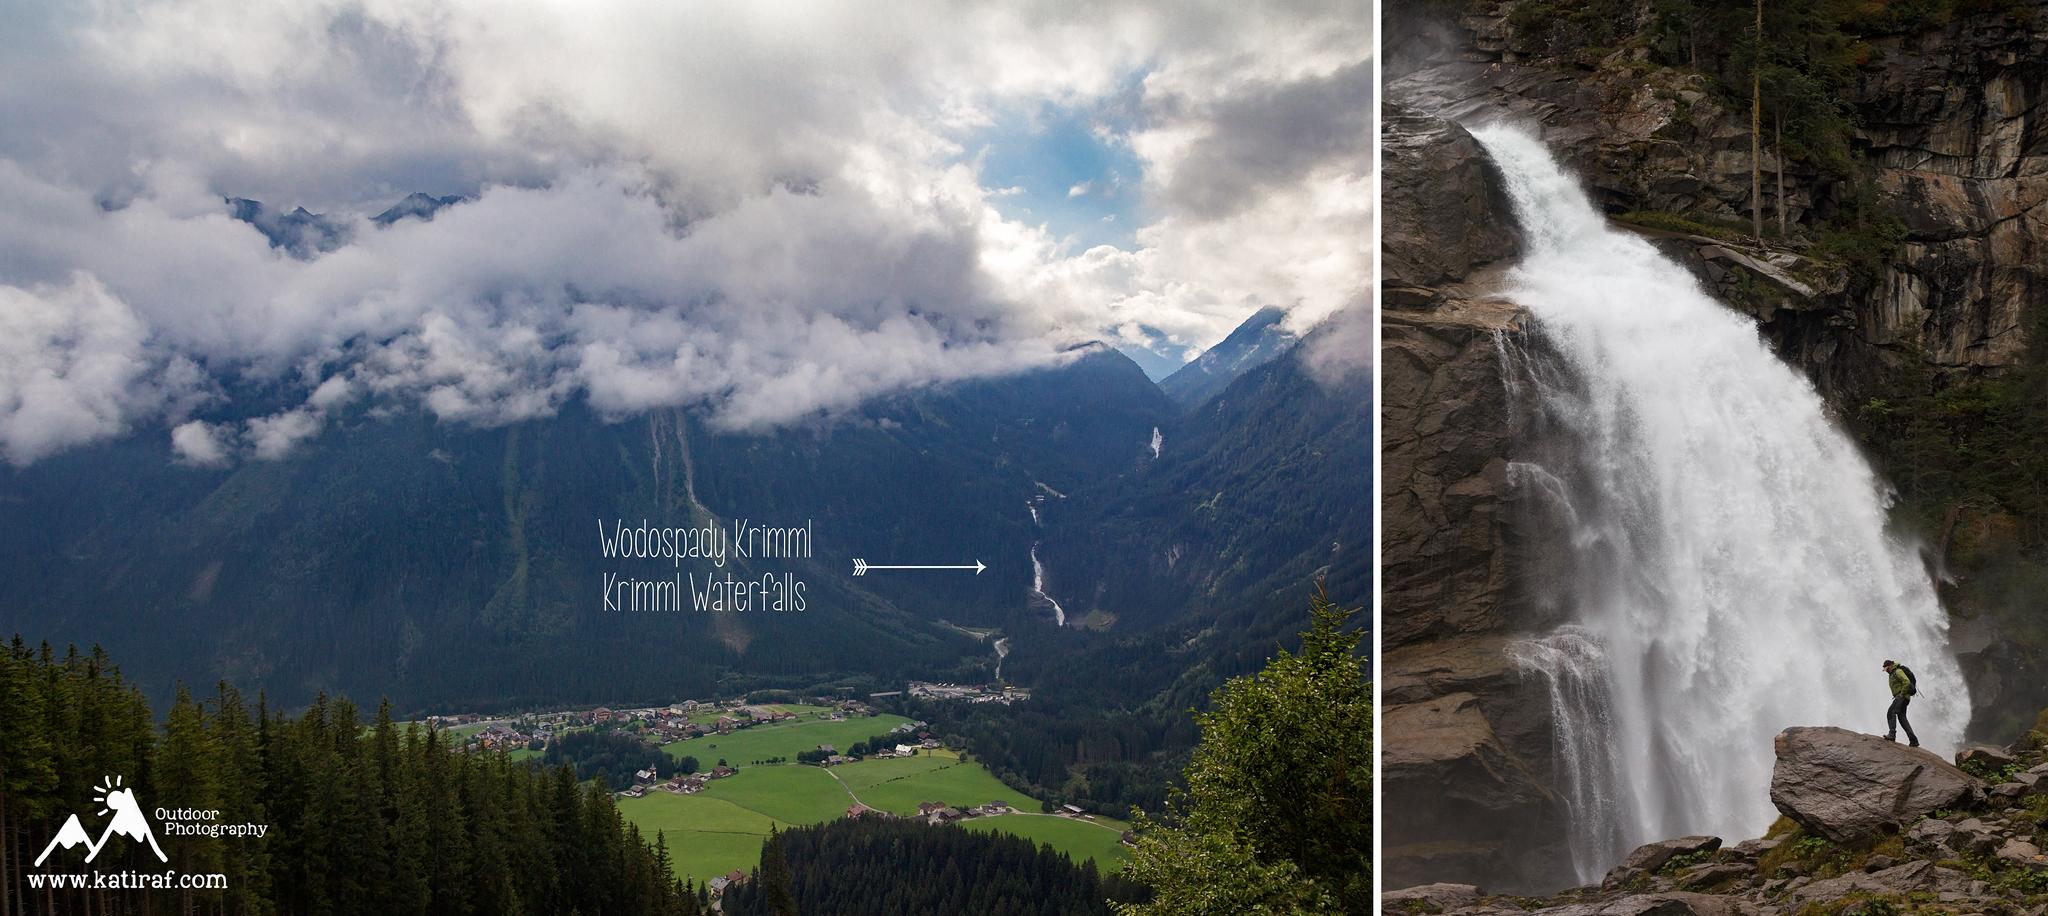 katiraf-austria-krimml-wodospady